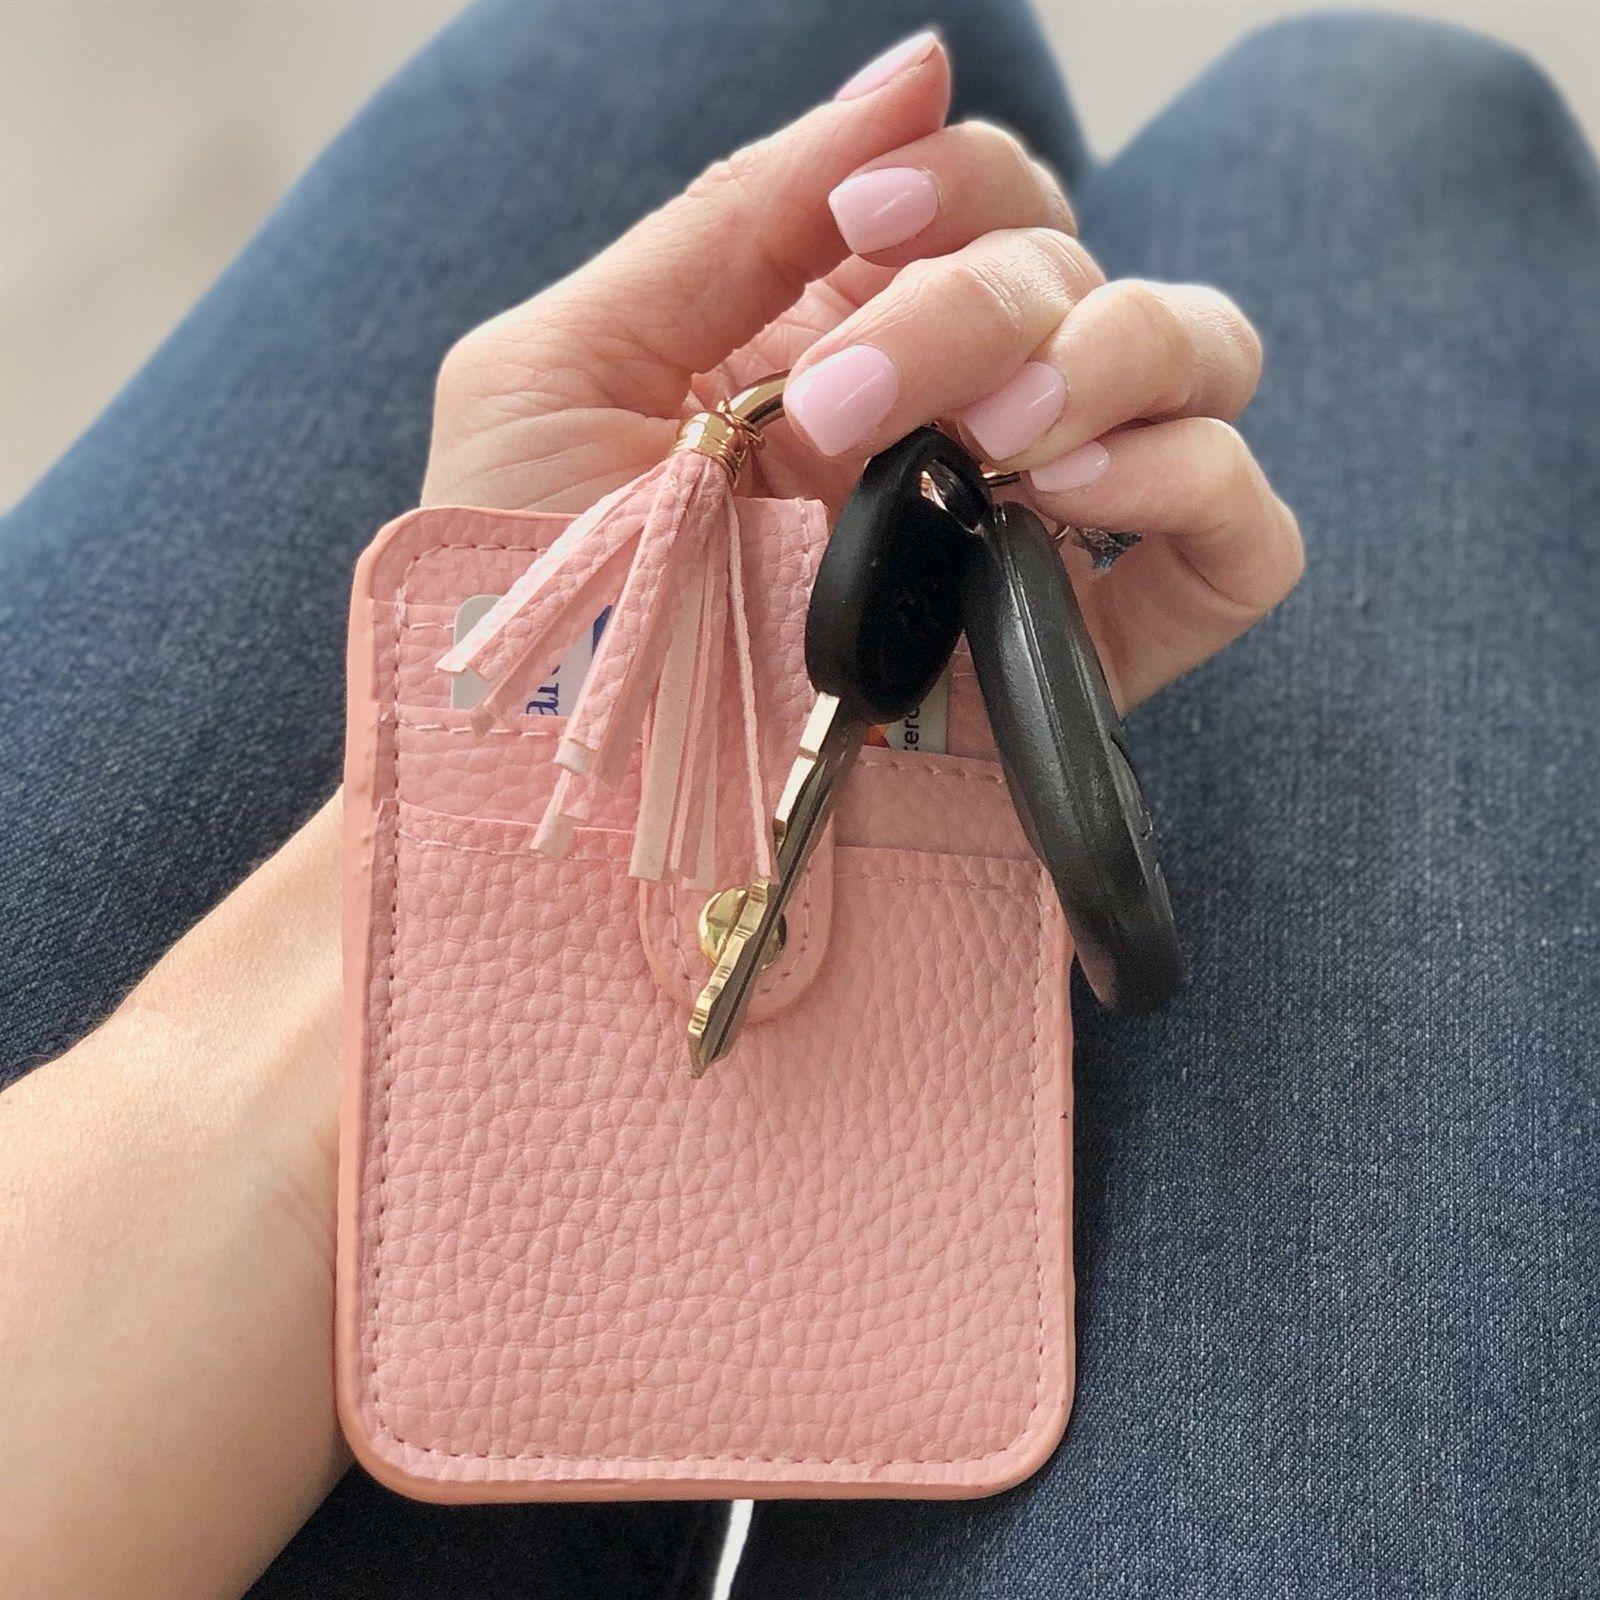 Credit card wallet keychain in 2020 keychain wallet